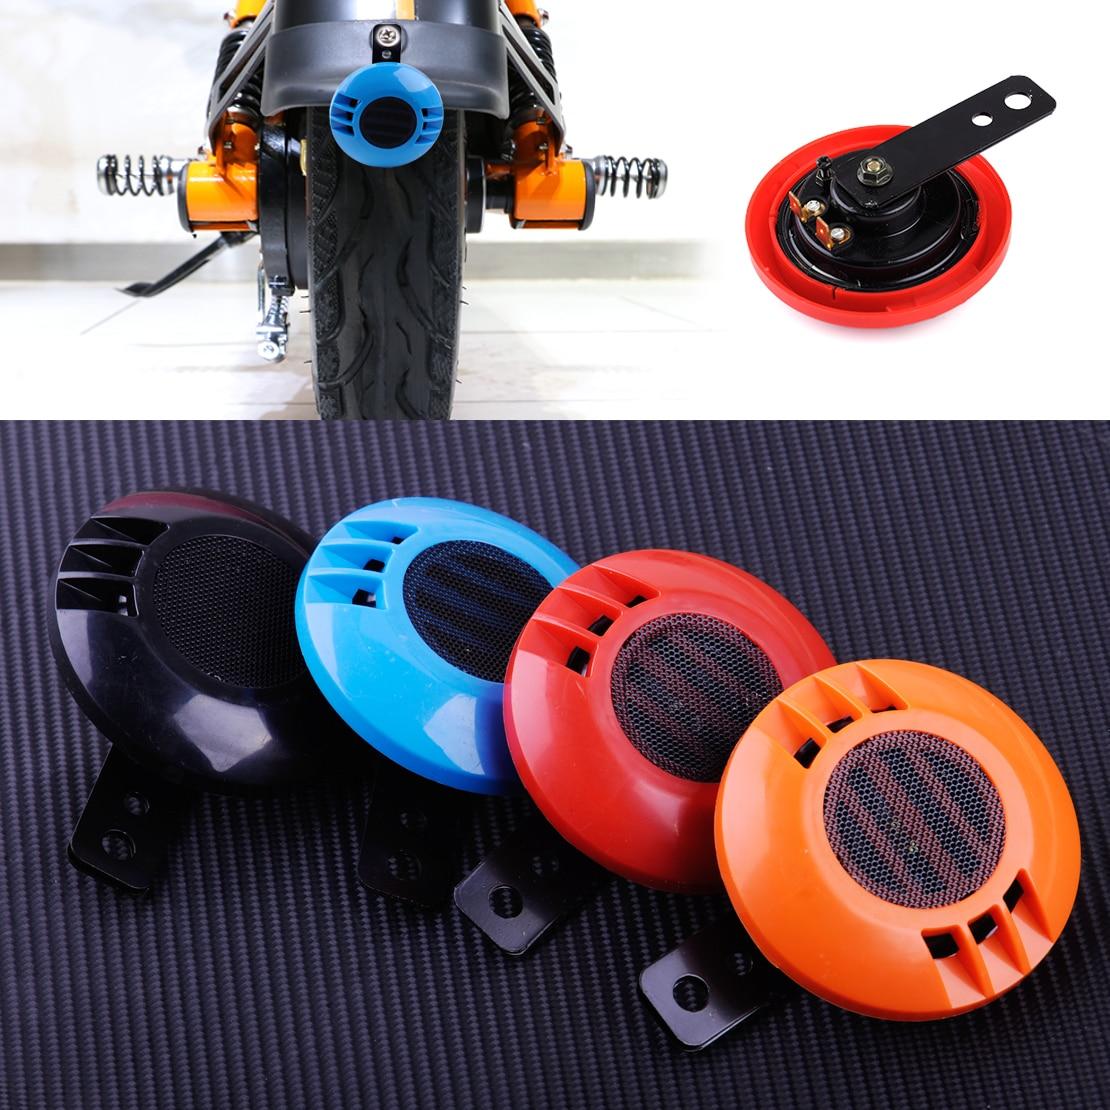 DWCX Motorcycle Super Sound 12V Waterproof Loud 105 dB 430Hz Snail Horn ABS Plastic & Metal for Car Bike